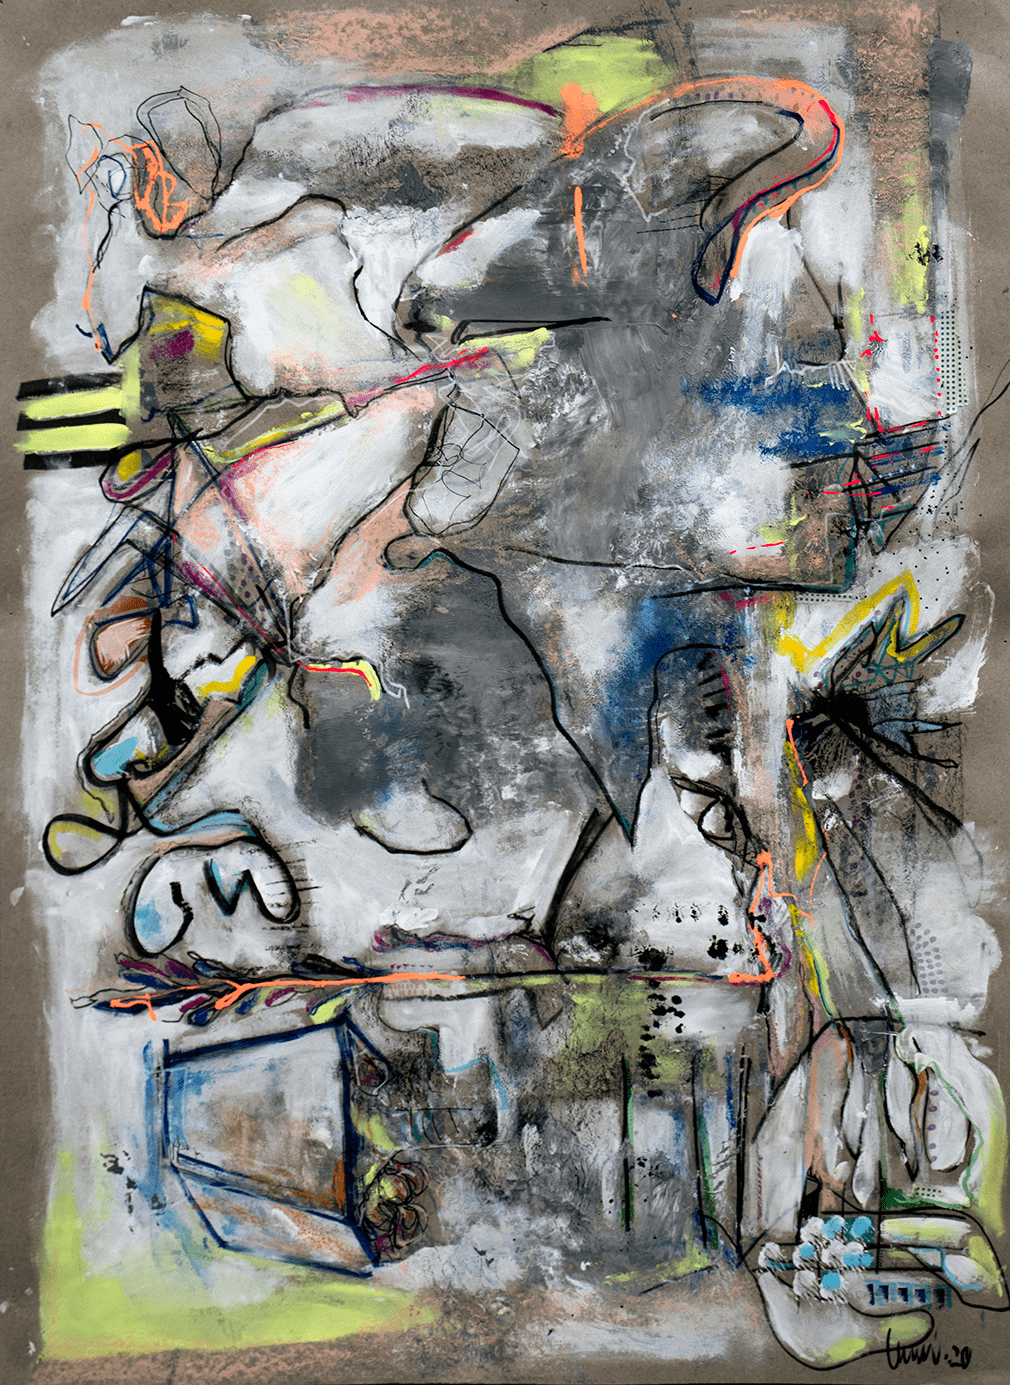 Lu Villanueva, Terrazza, 2020, Acrylic, charcoal, spray paint, oil stick on paper, 95 x 71 cm, © The Artist